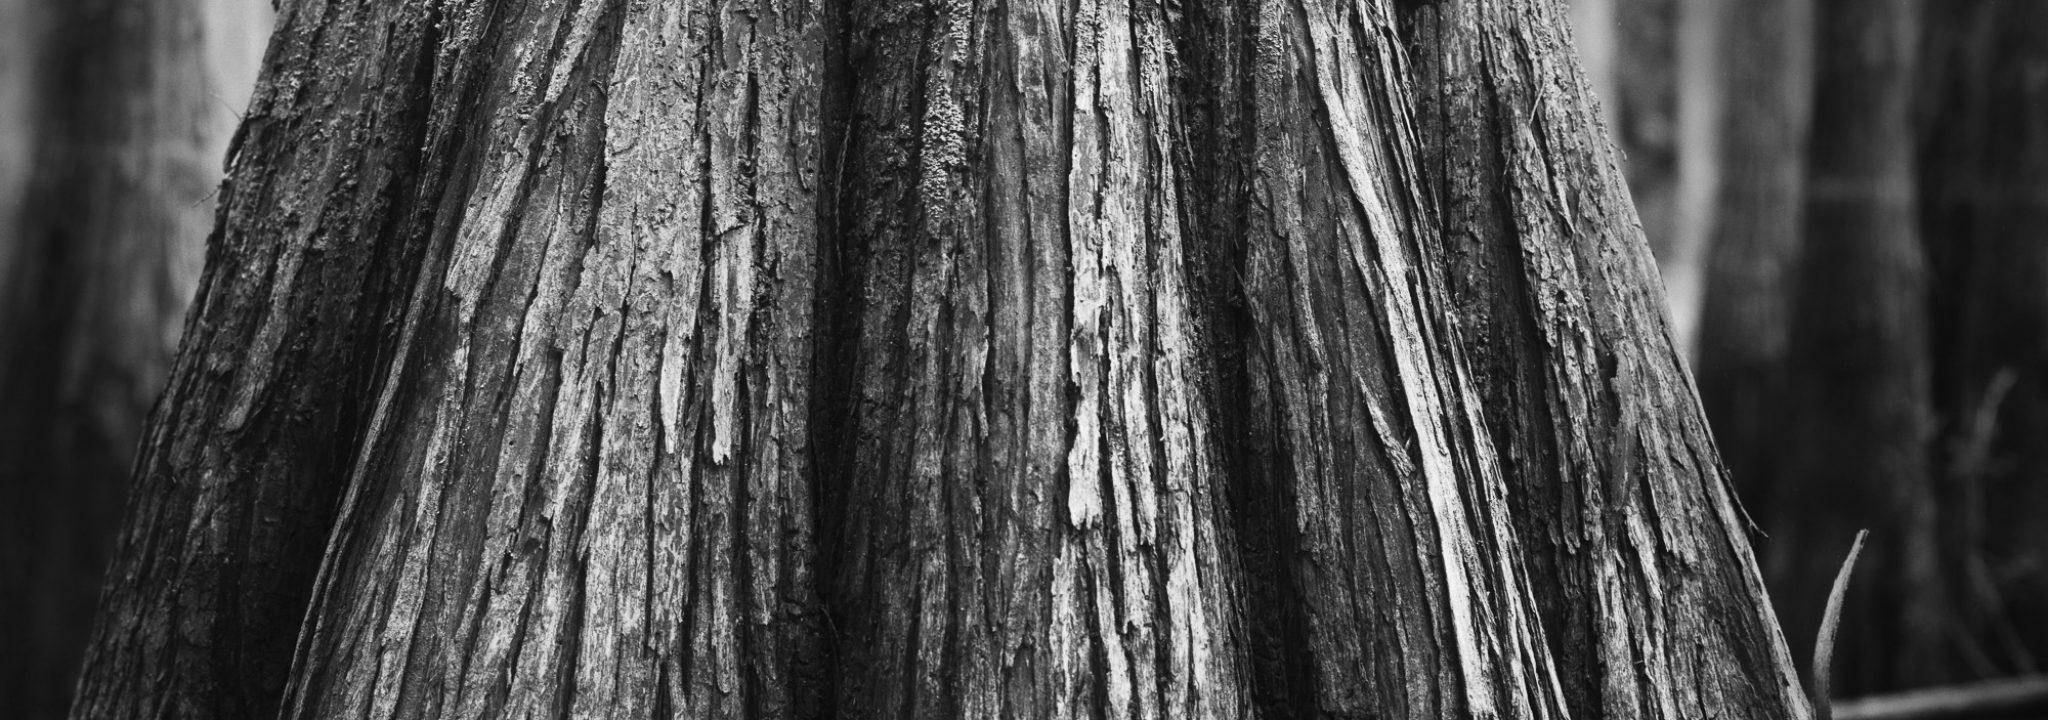 Pond Cypress 01